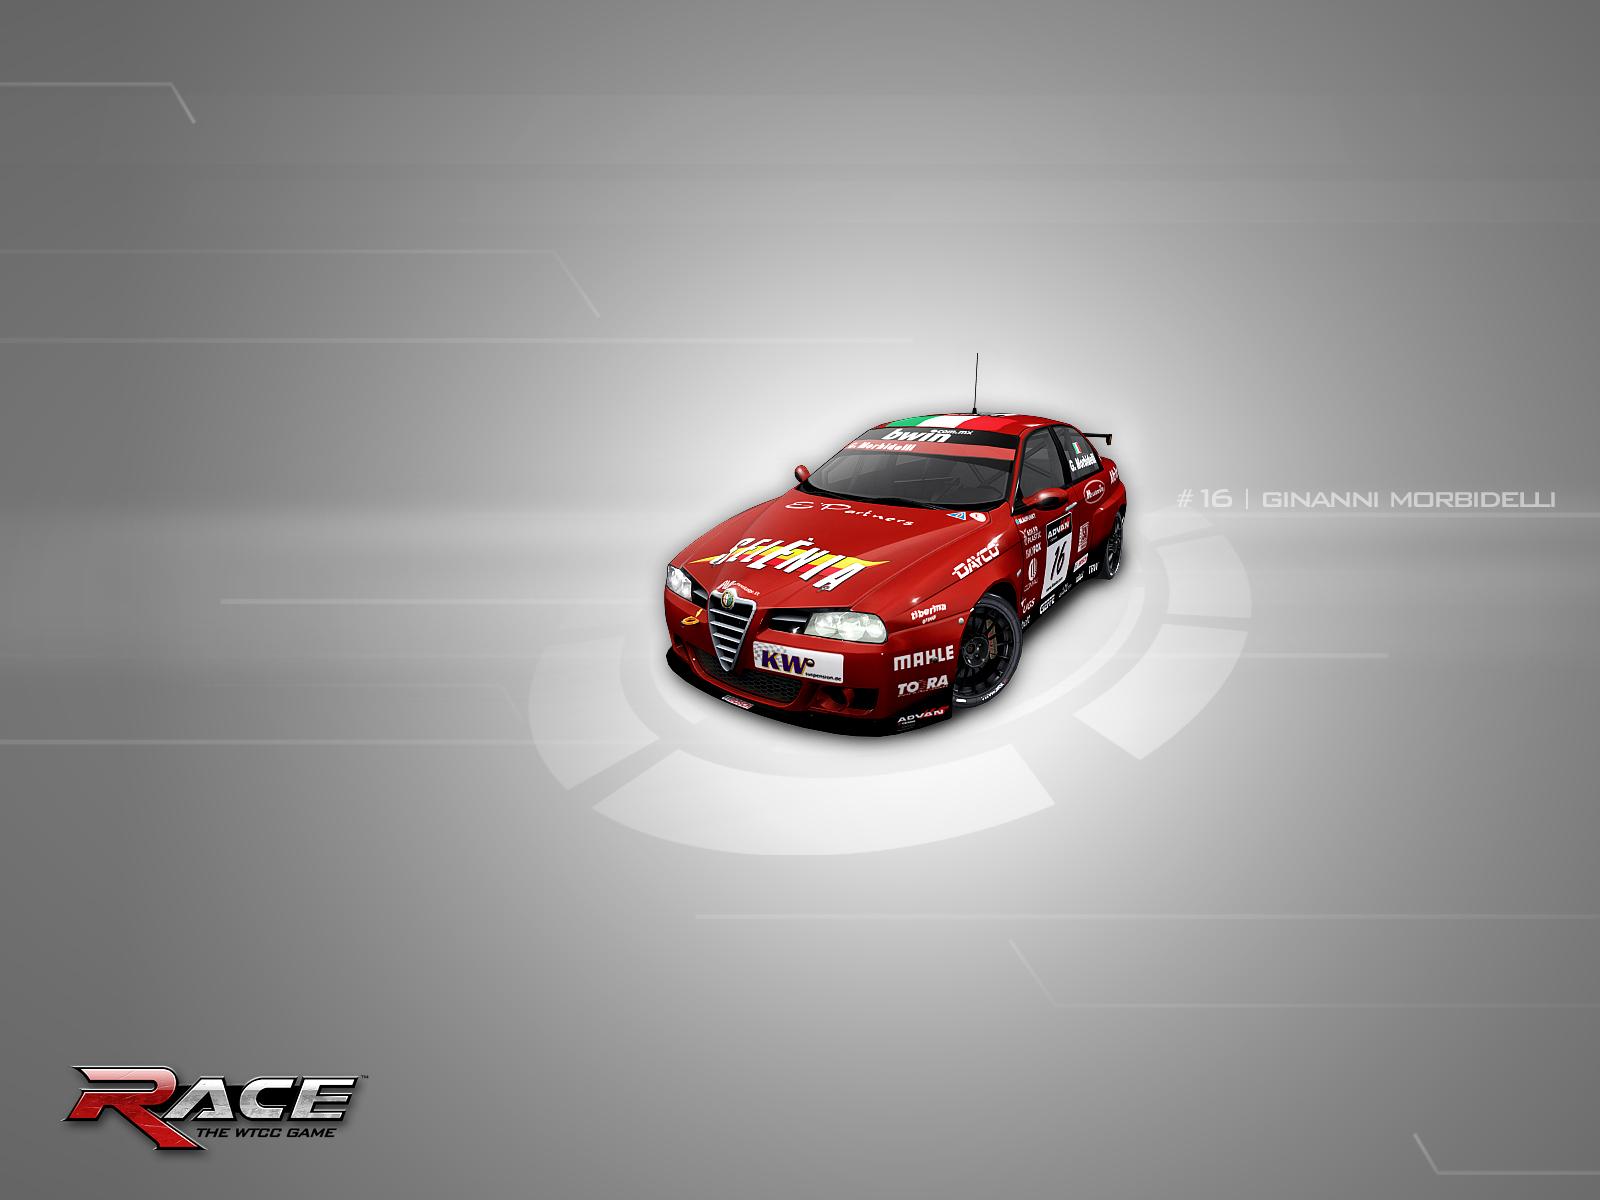 Wallpaper RACE 2. 1024x768, 60 Kb.